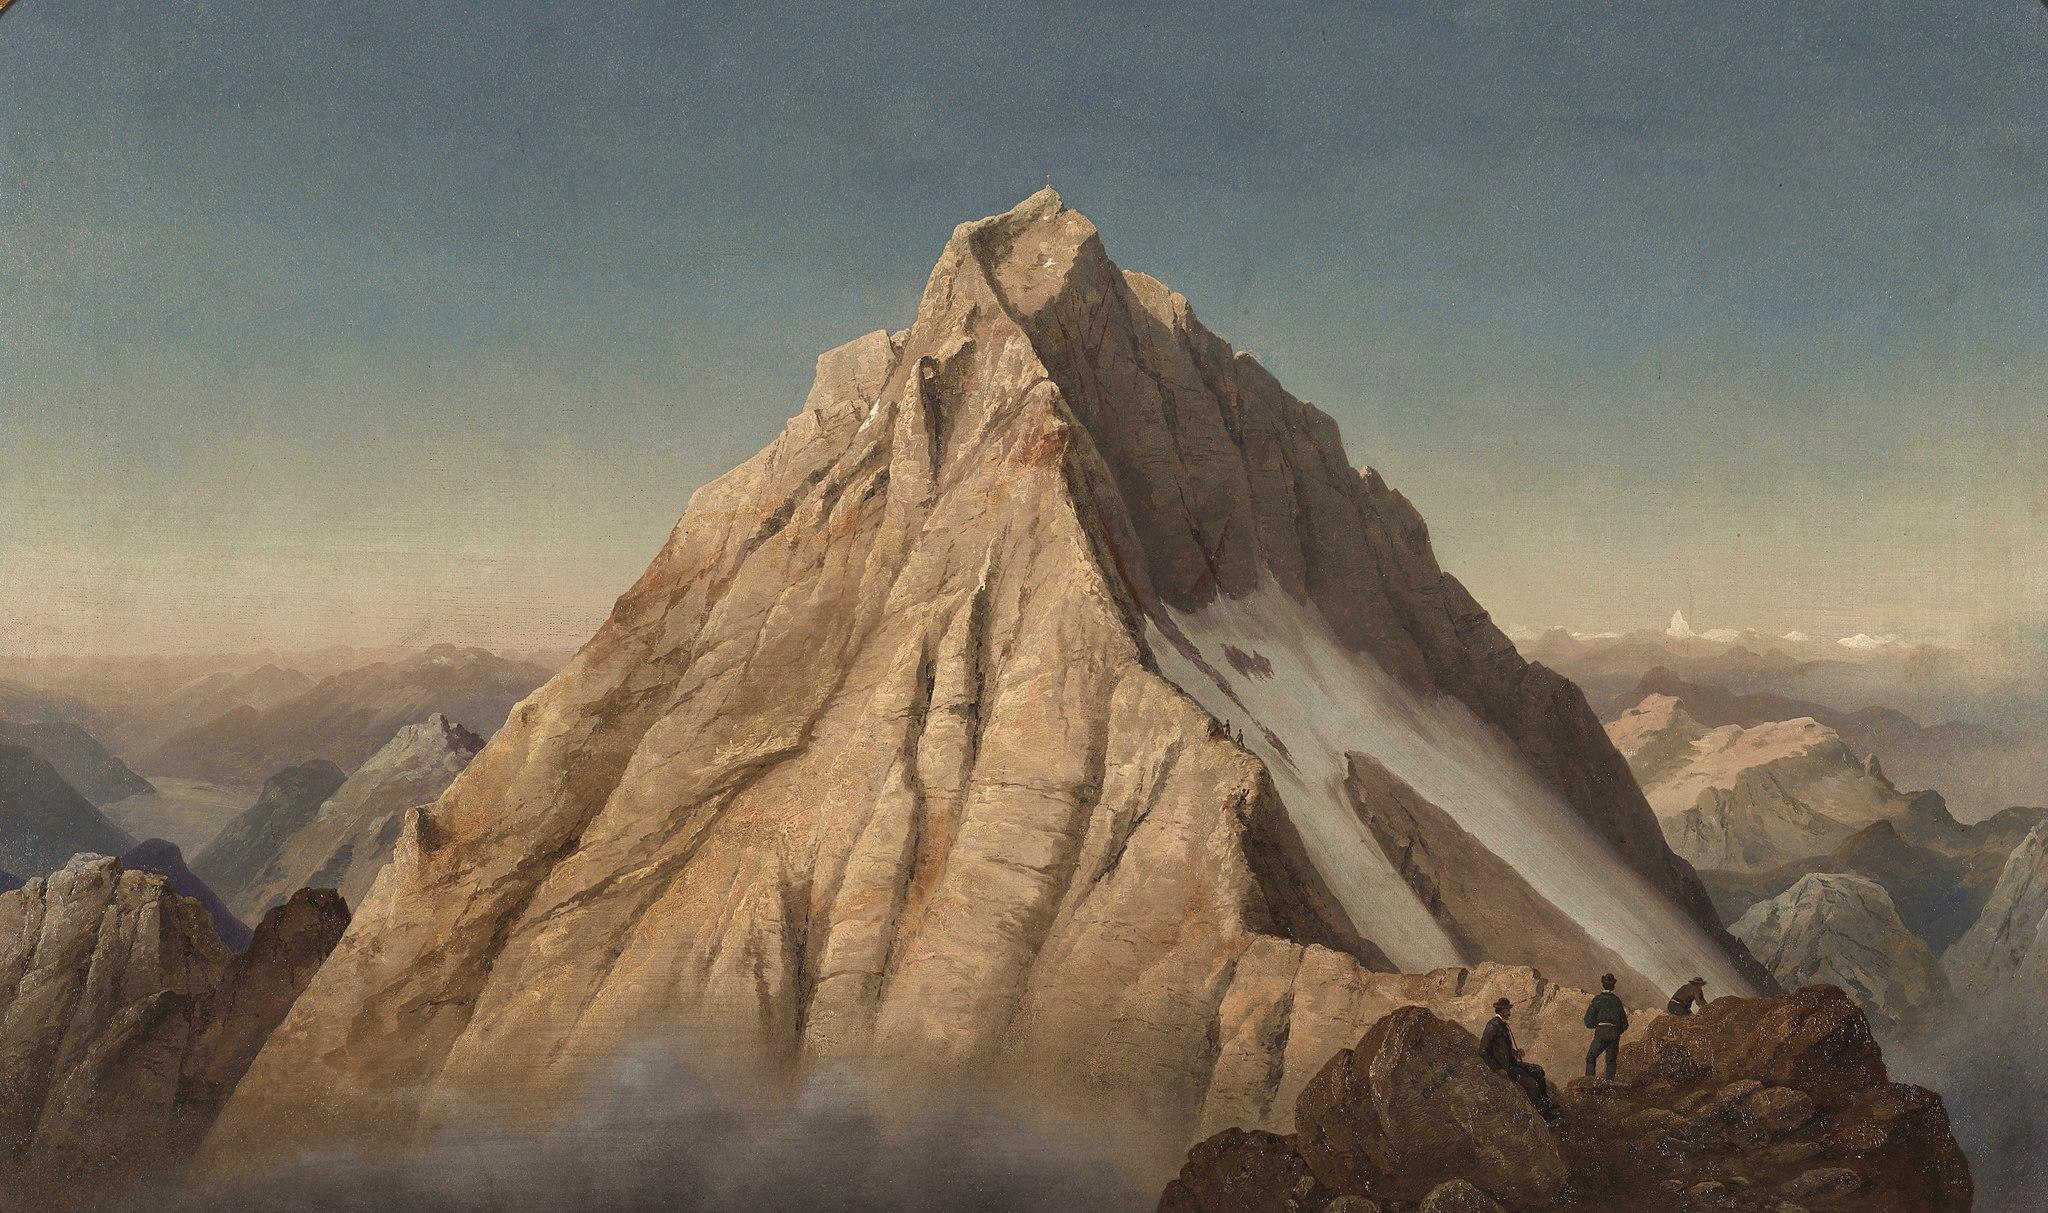 Marko_Pernhart_-_Peak_of_Mount_Triglav